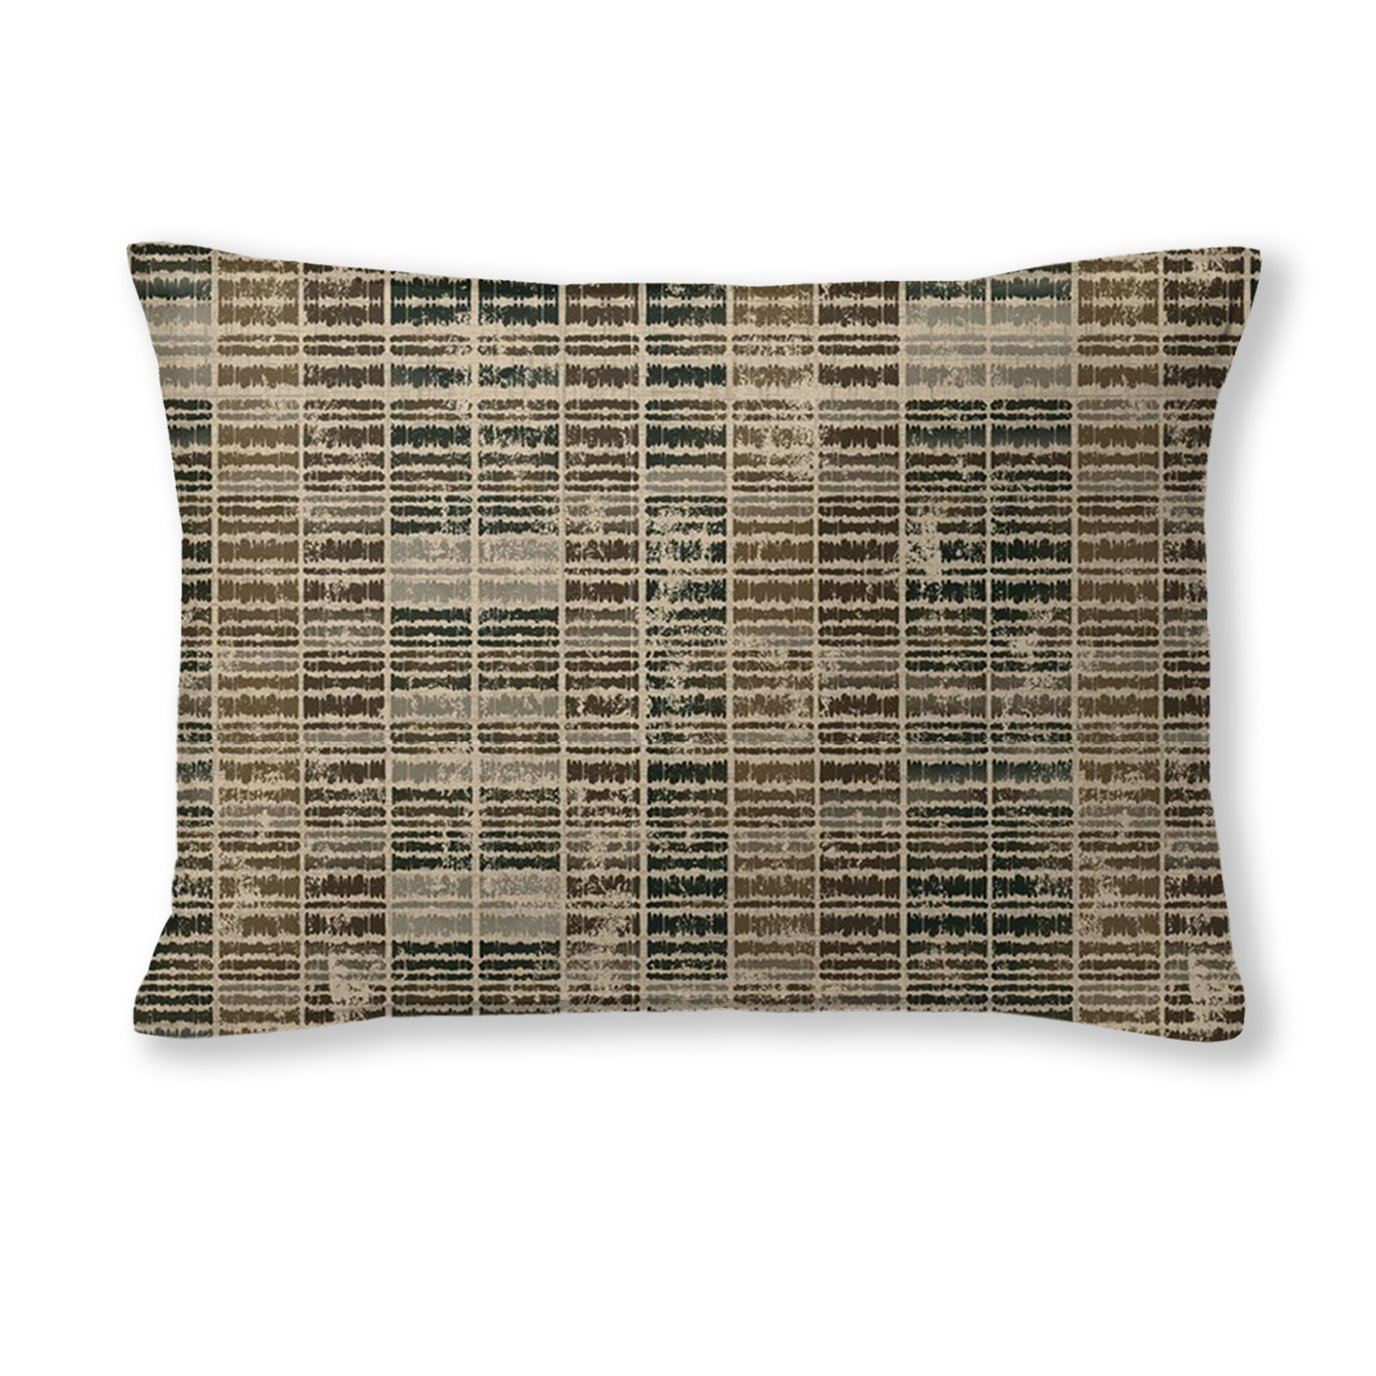 "Eaton Cocoa Grand Decor Decorative Cushion - 18"" x 36"""